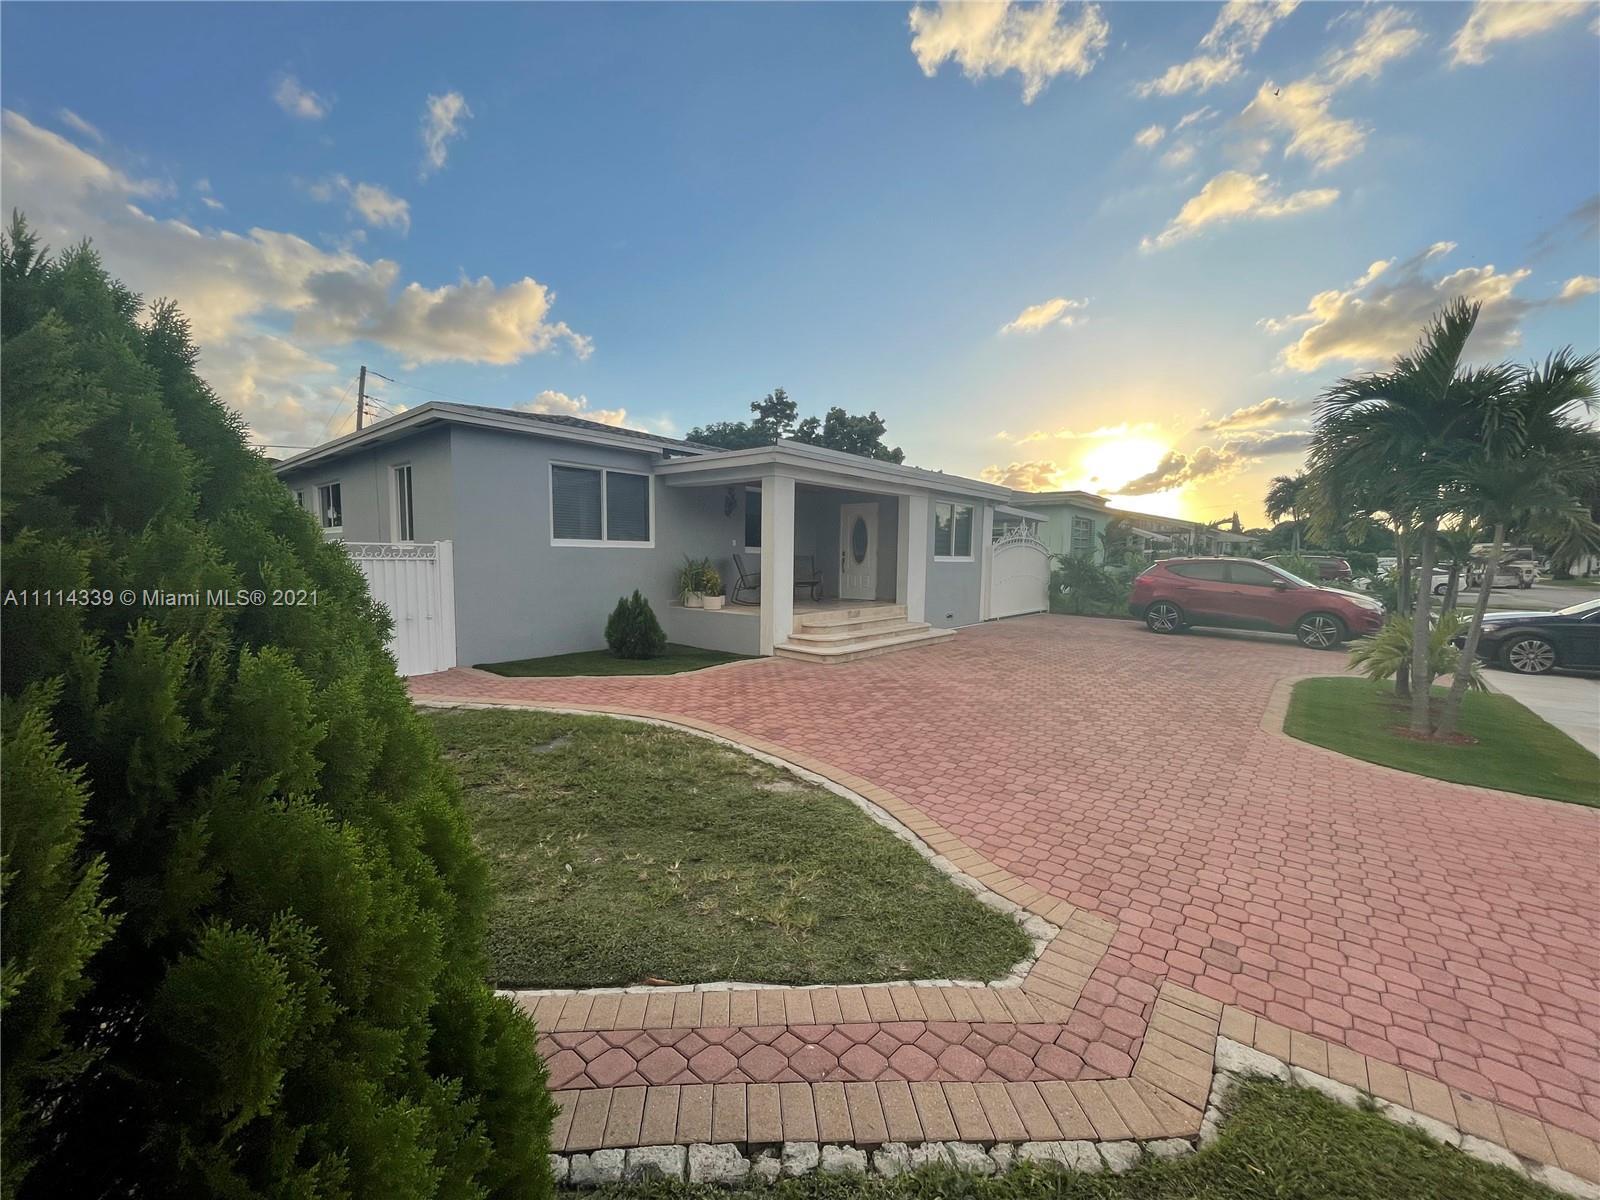 Single Family Home,For Sale,182 E 52nd Pl, Hialeah, Florida 33013,Brickell,realty,broker,condos near me